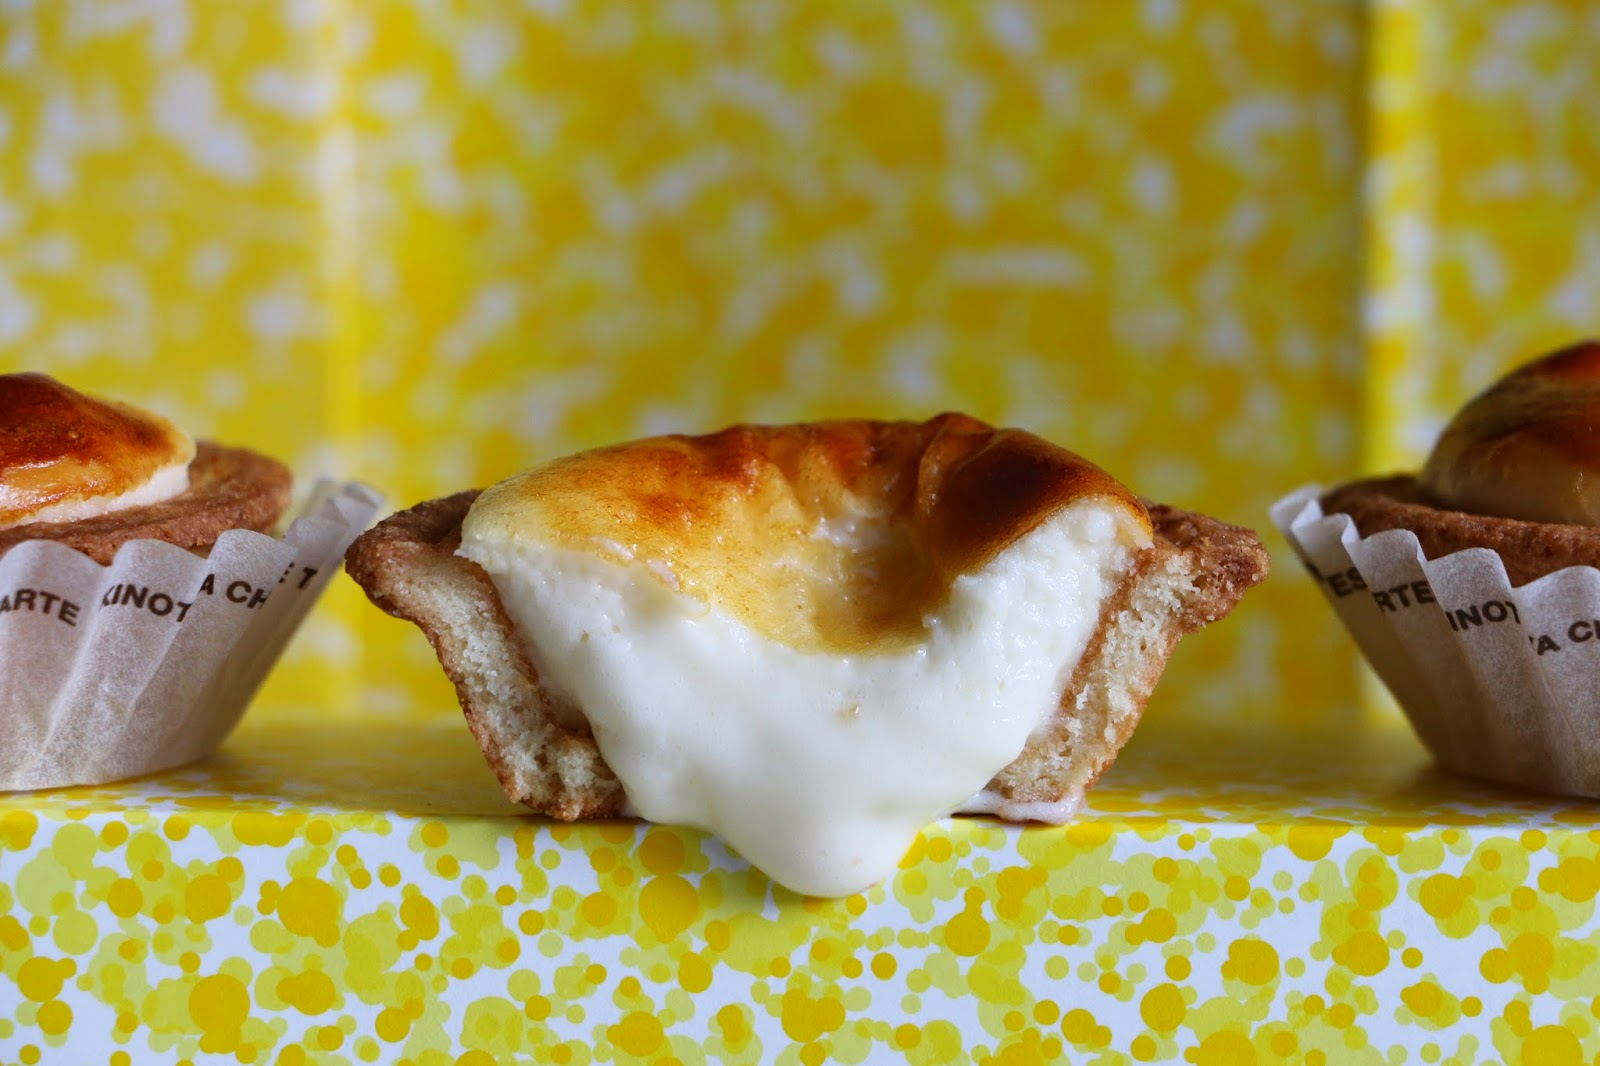 Bake cheese tart, Spot The Food